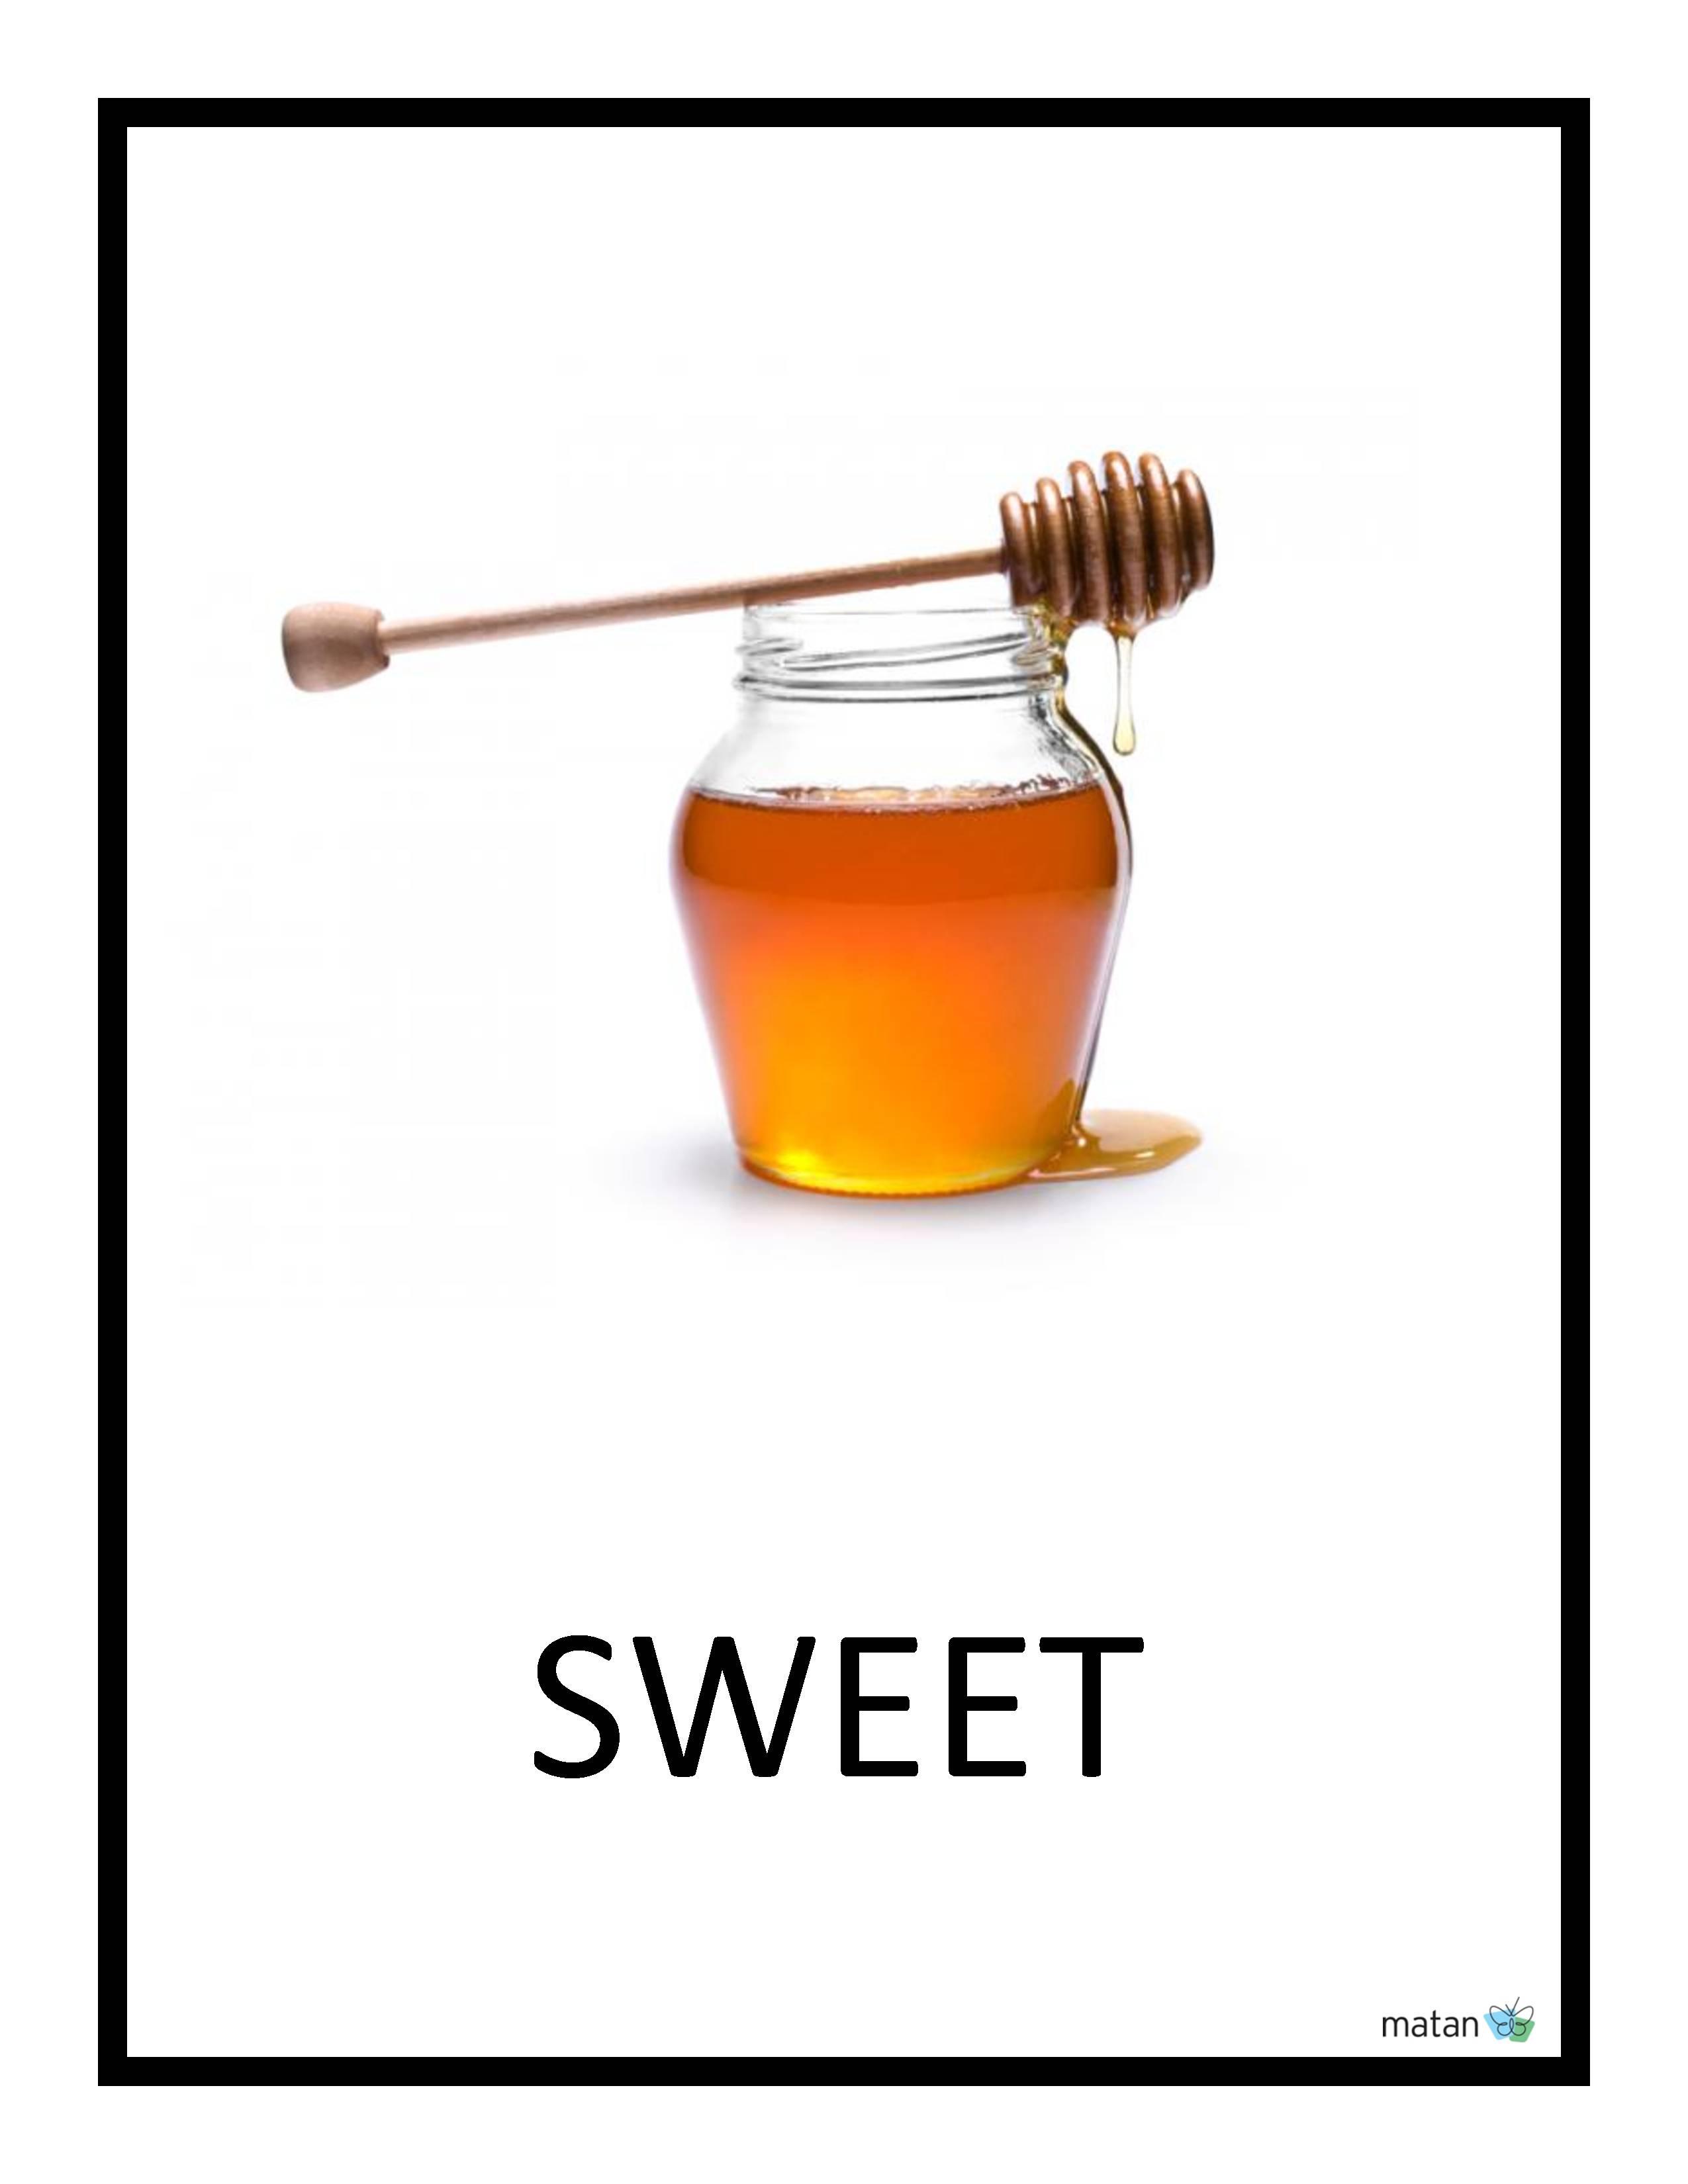 A Tu B Shevat Taste Test